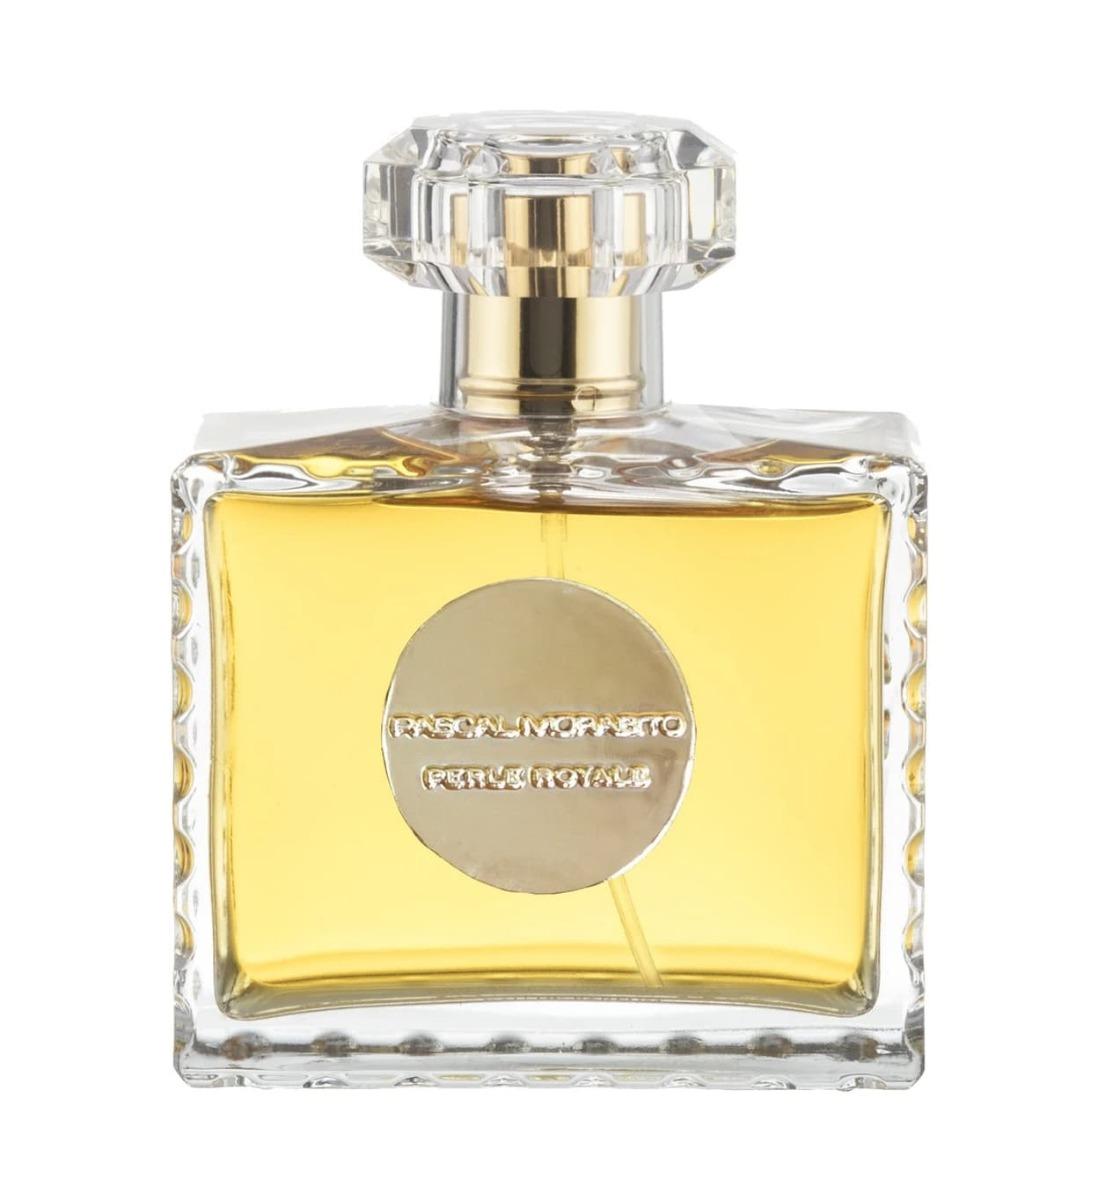 Pascal Morabito - Perle Royale - Eau de Parfum